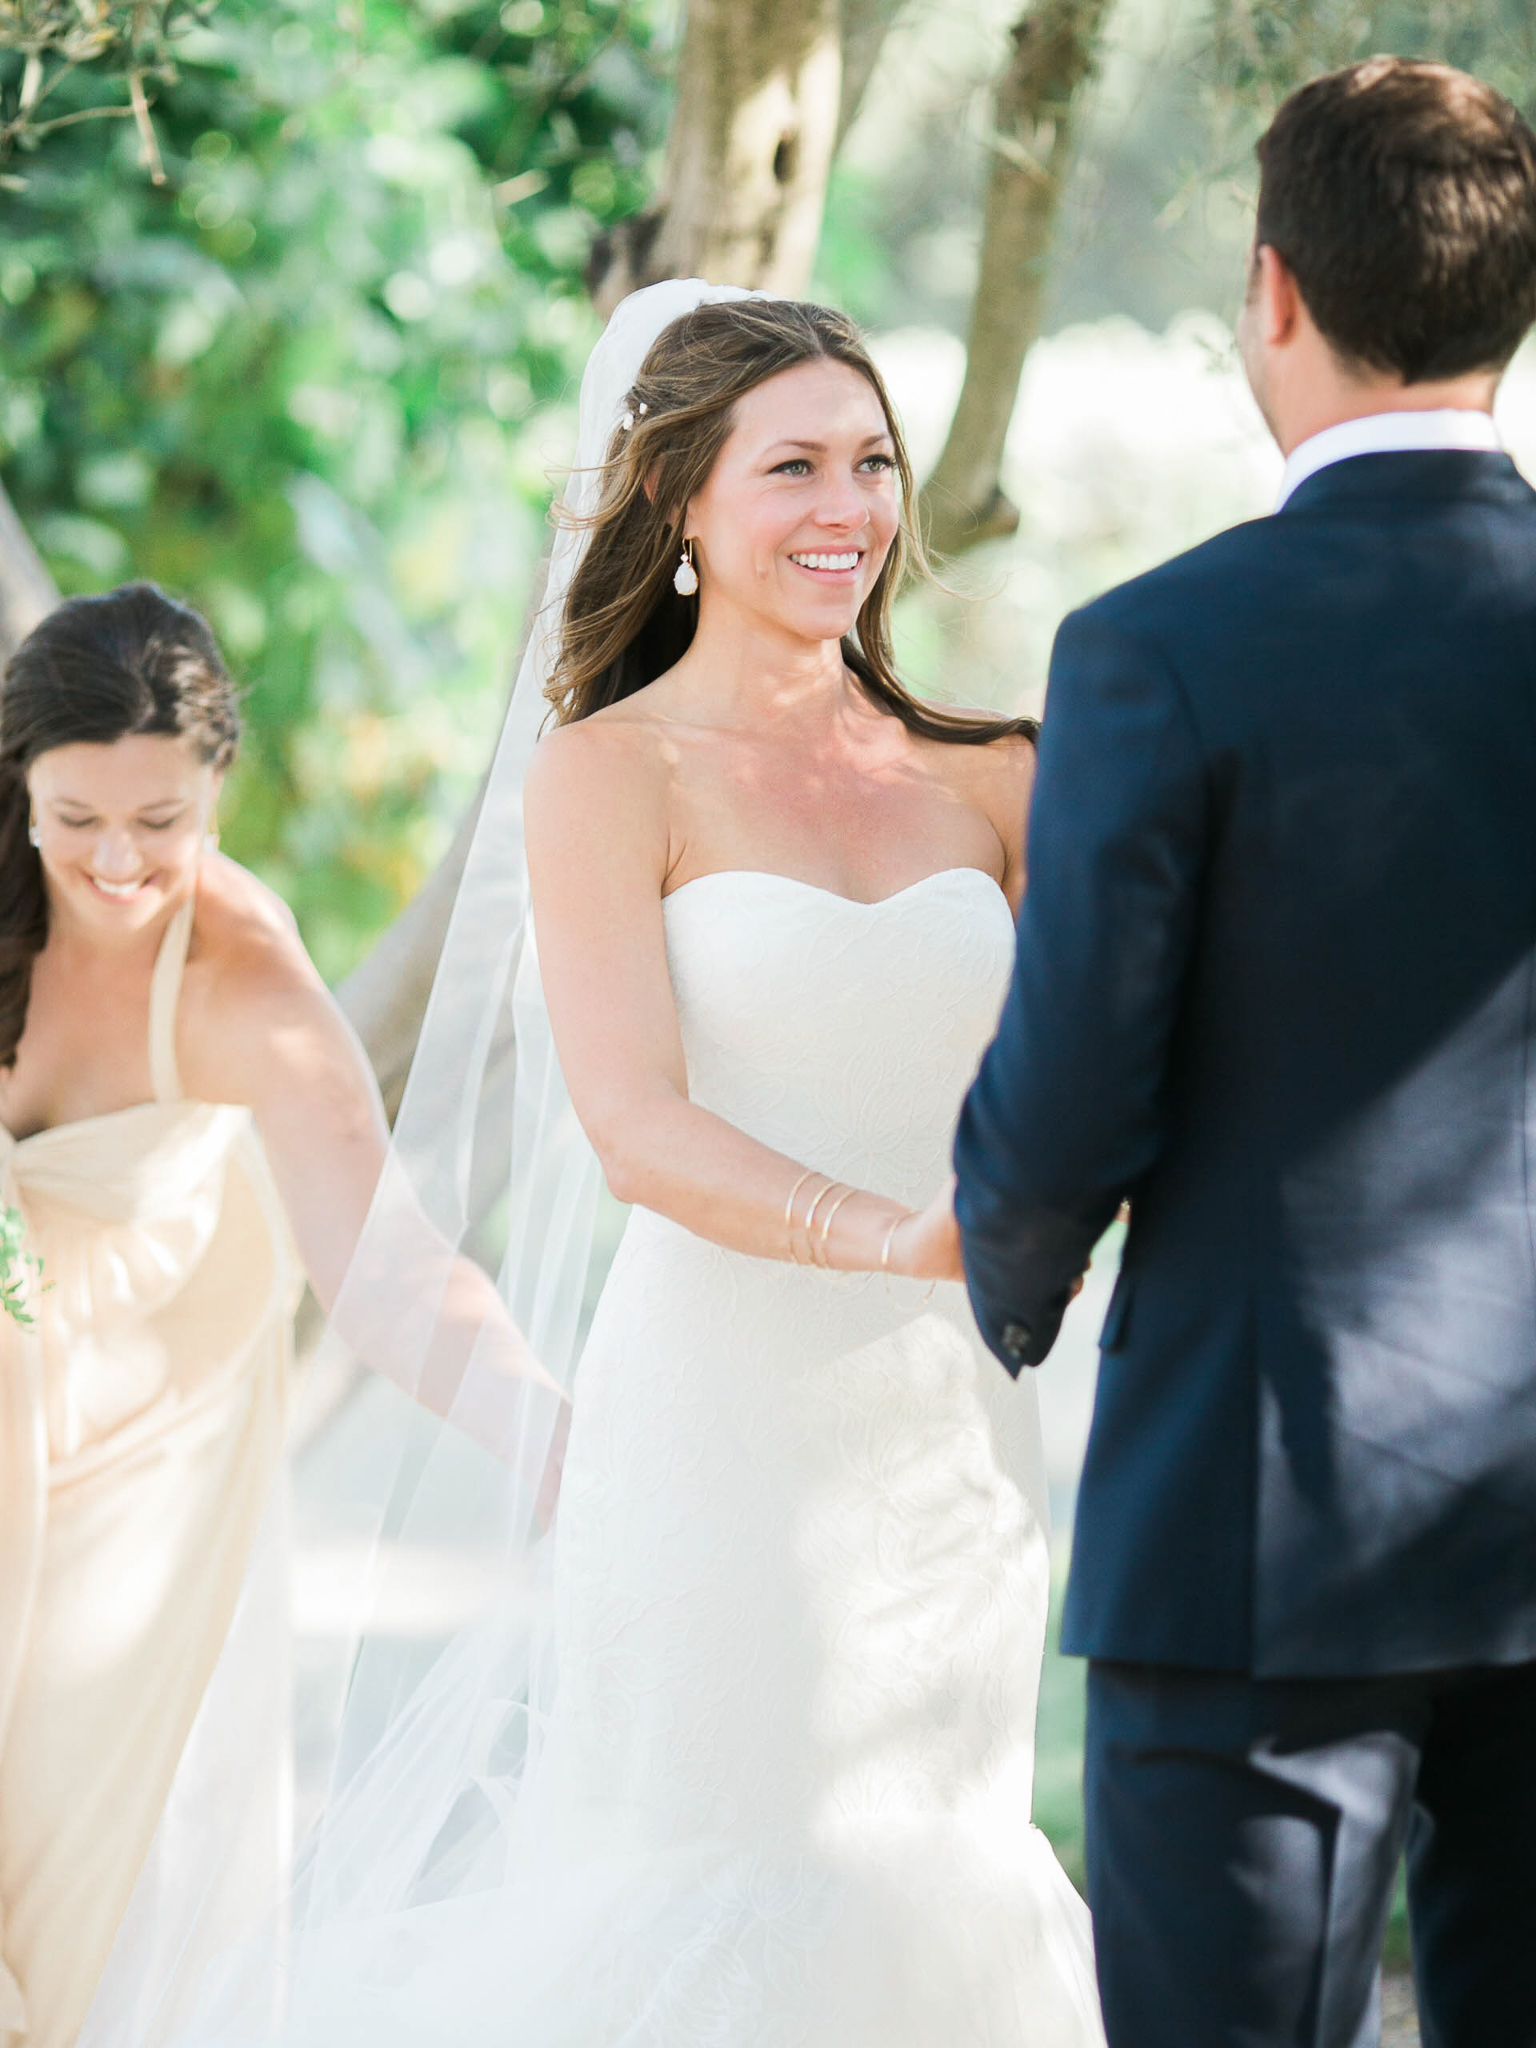 Meghan Mehan Photography - Fine Art Film Wedding Photography - San Francisco   Napa   Sonoma   Big Sur   Chicago   Minneapolis   Milwaukee   Lake Geneva   Door County   Wisconsin 027.jpg